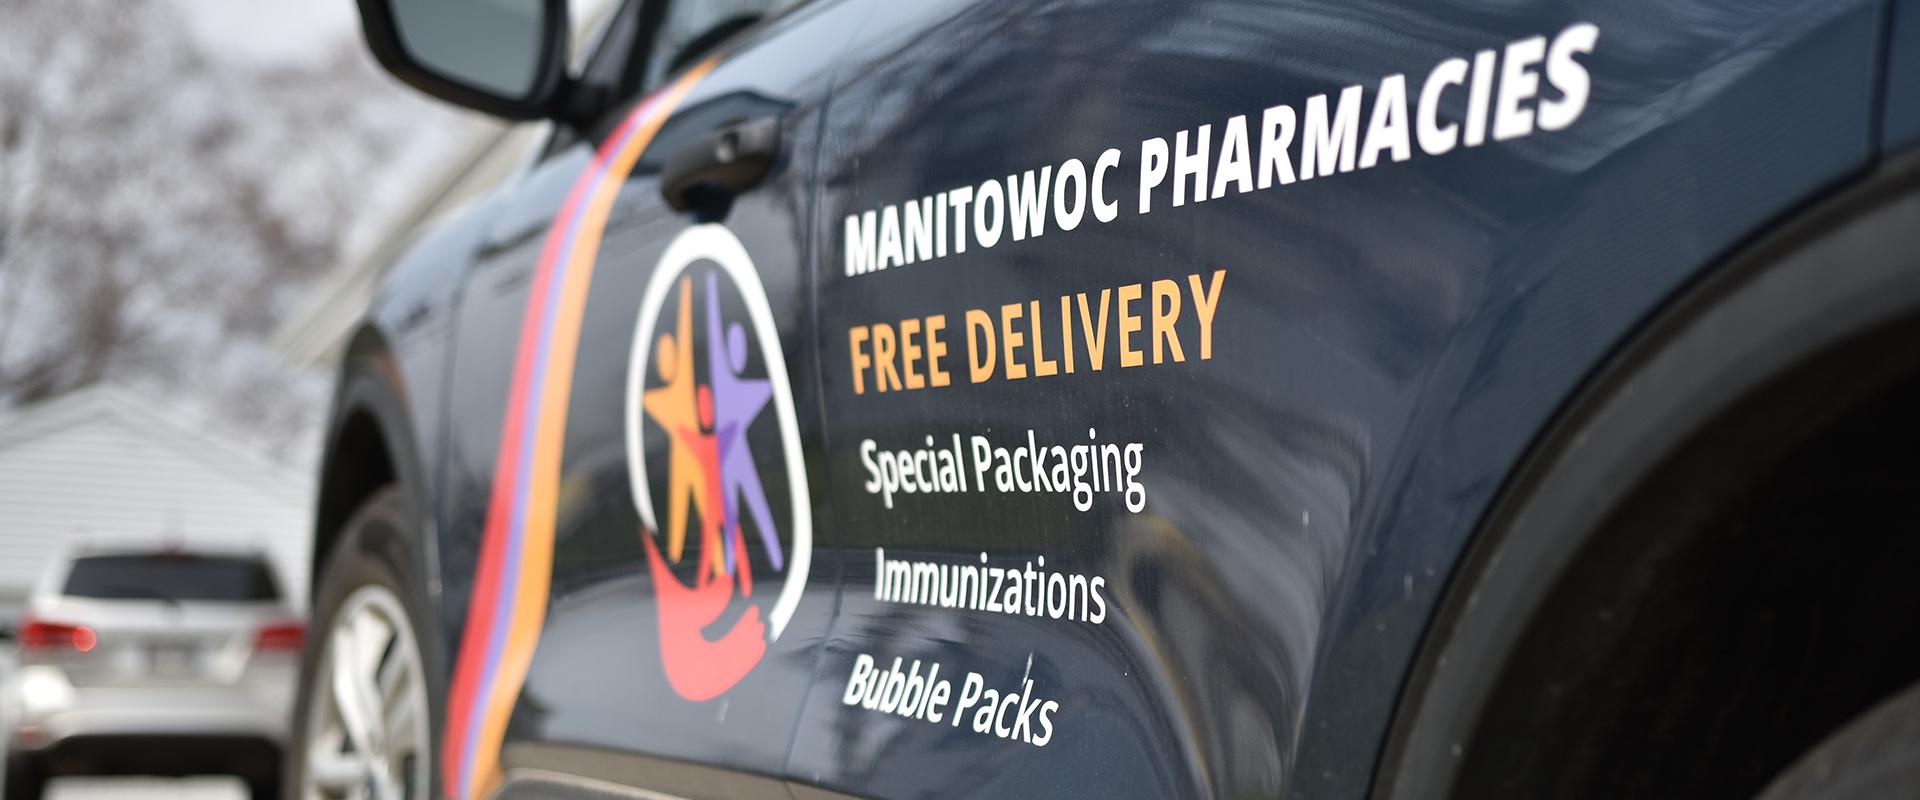 Welcome to Manitowoc Pharmacies!